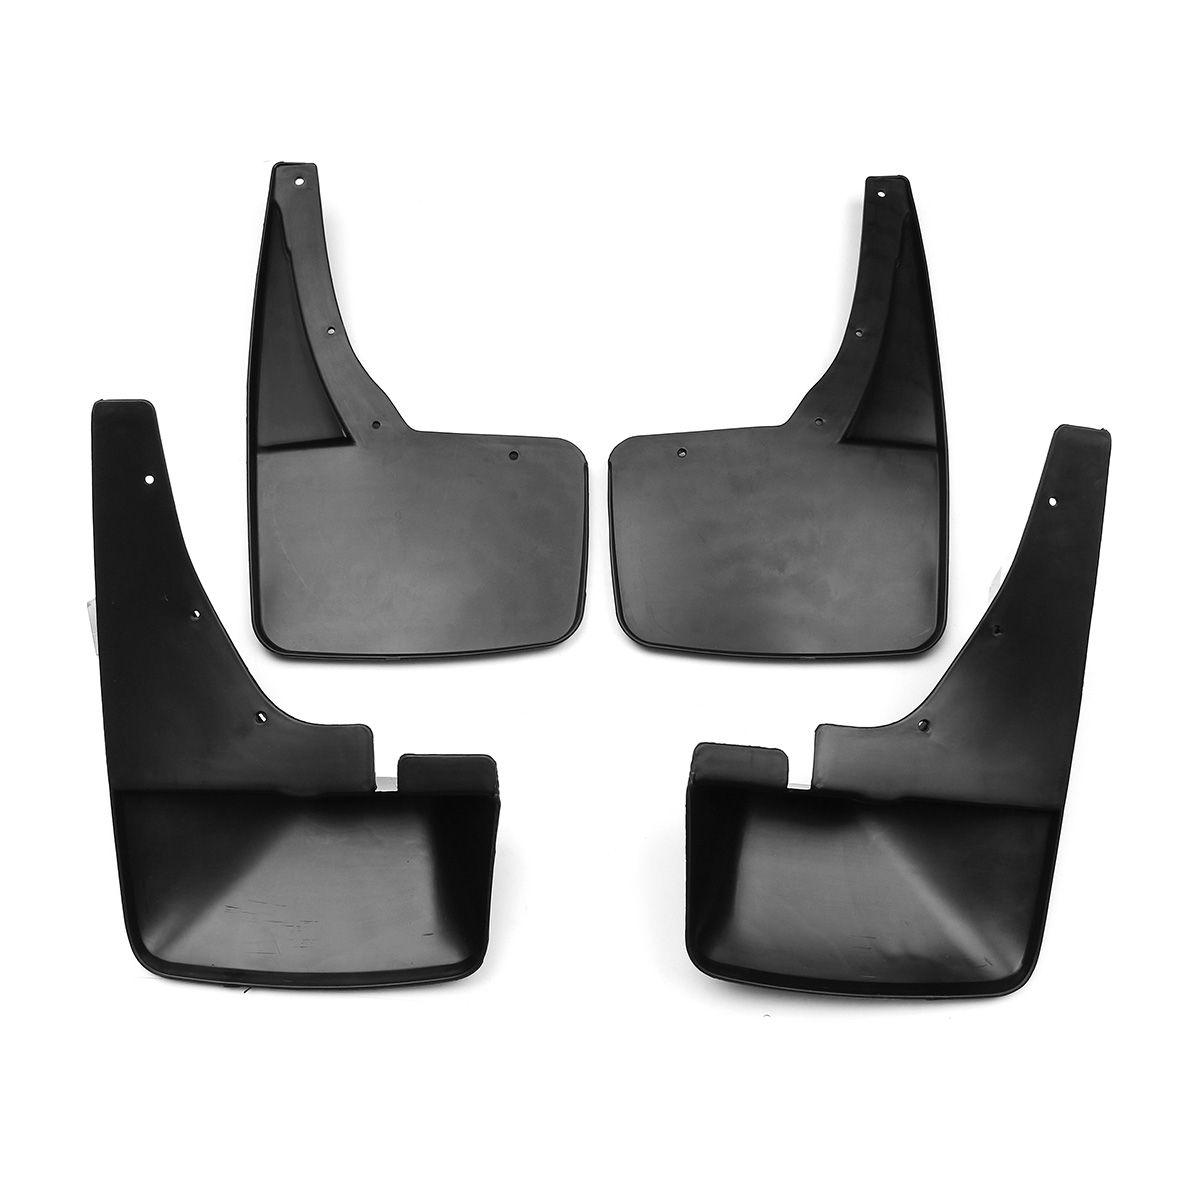 For Cadillac Escalade 2007-2014 GMT900 Car Mud Flaps Fender Mudguards Mudflaps Splash Guards Accessories